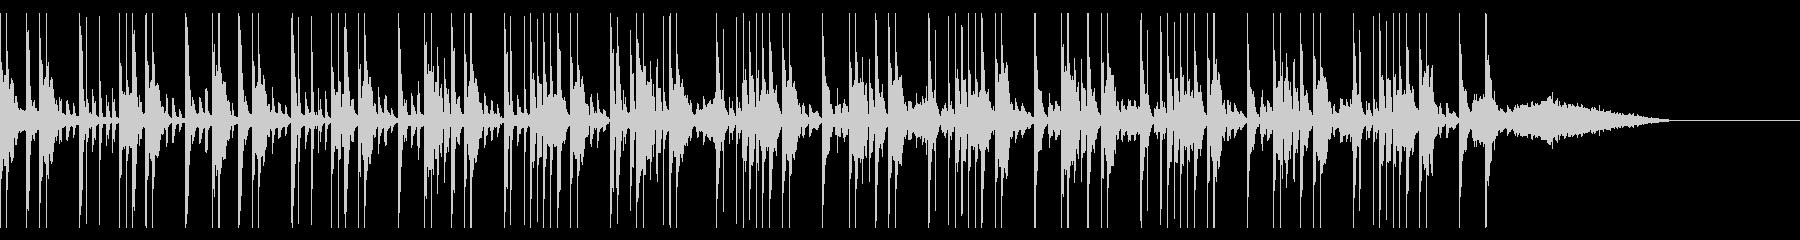 119 BPMの未再生の波形